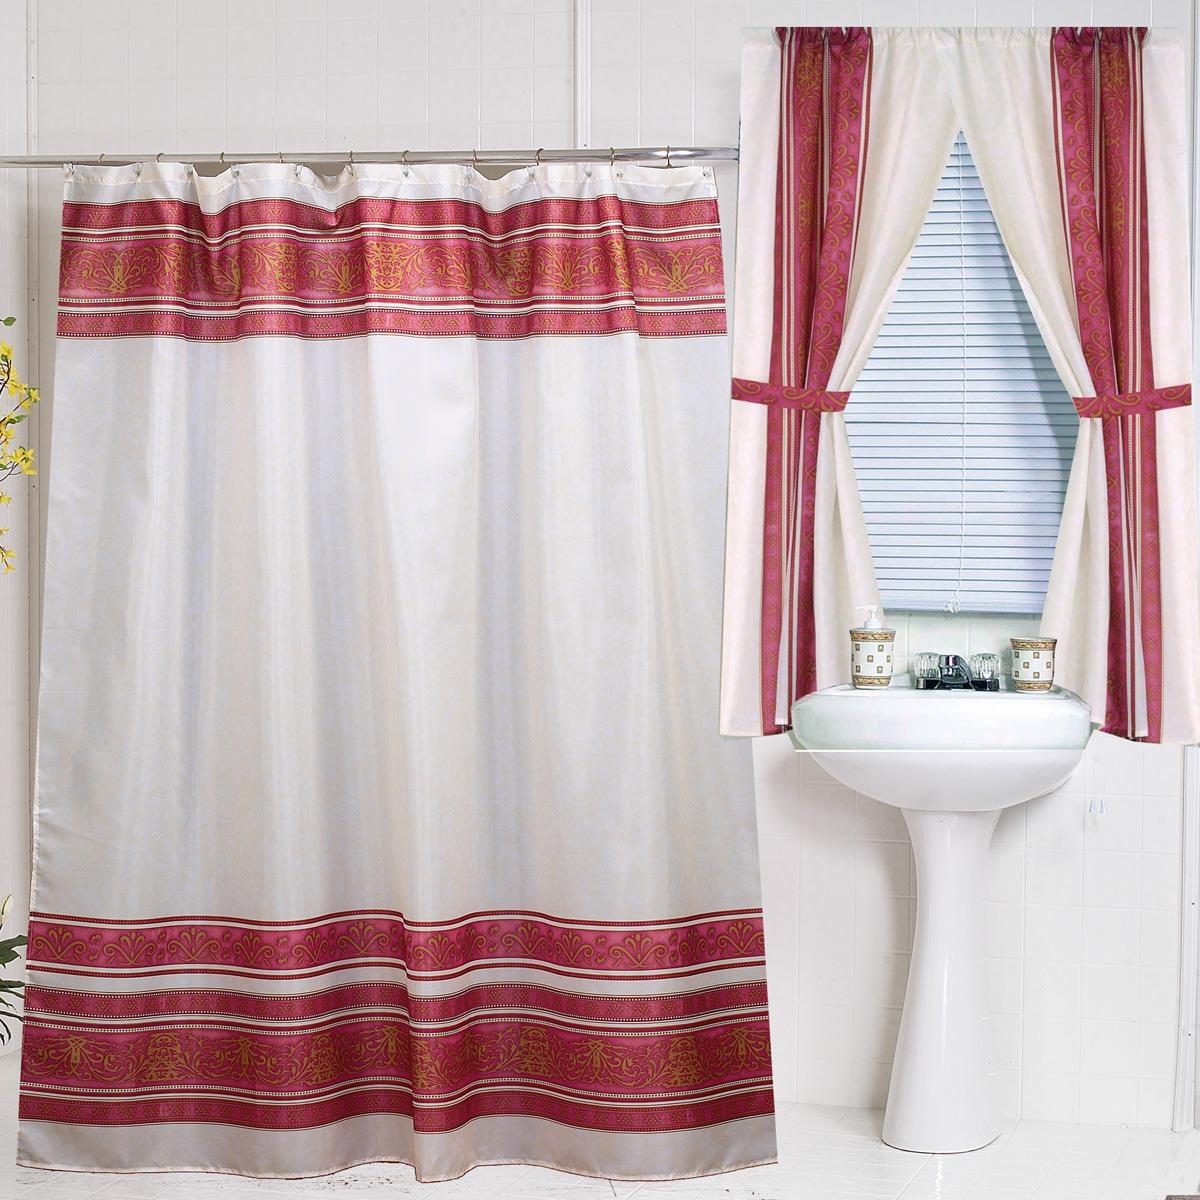 BURGUNDY SHOWER CURTAINS Curtains Blinds